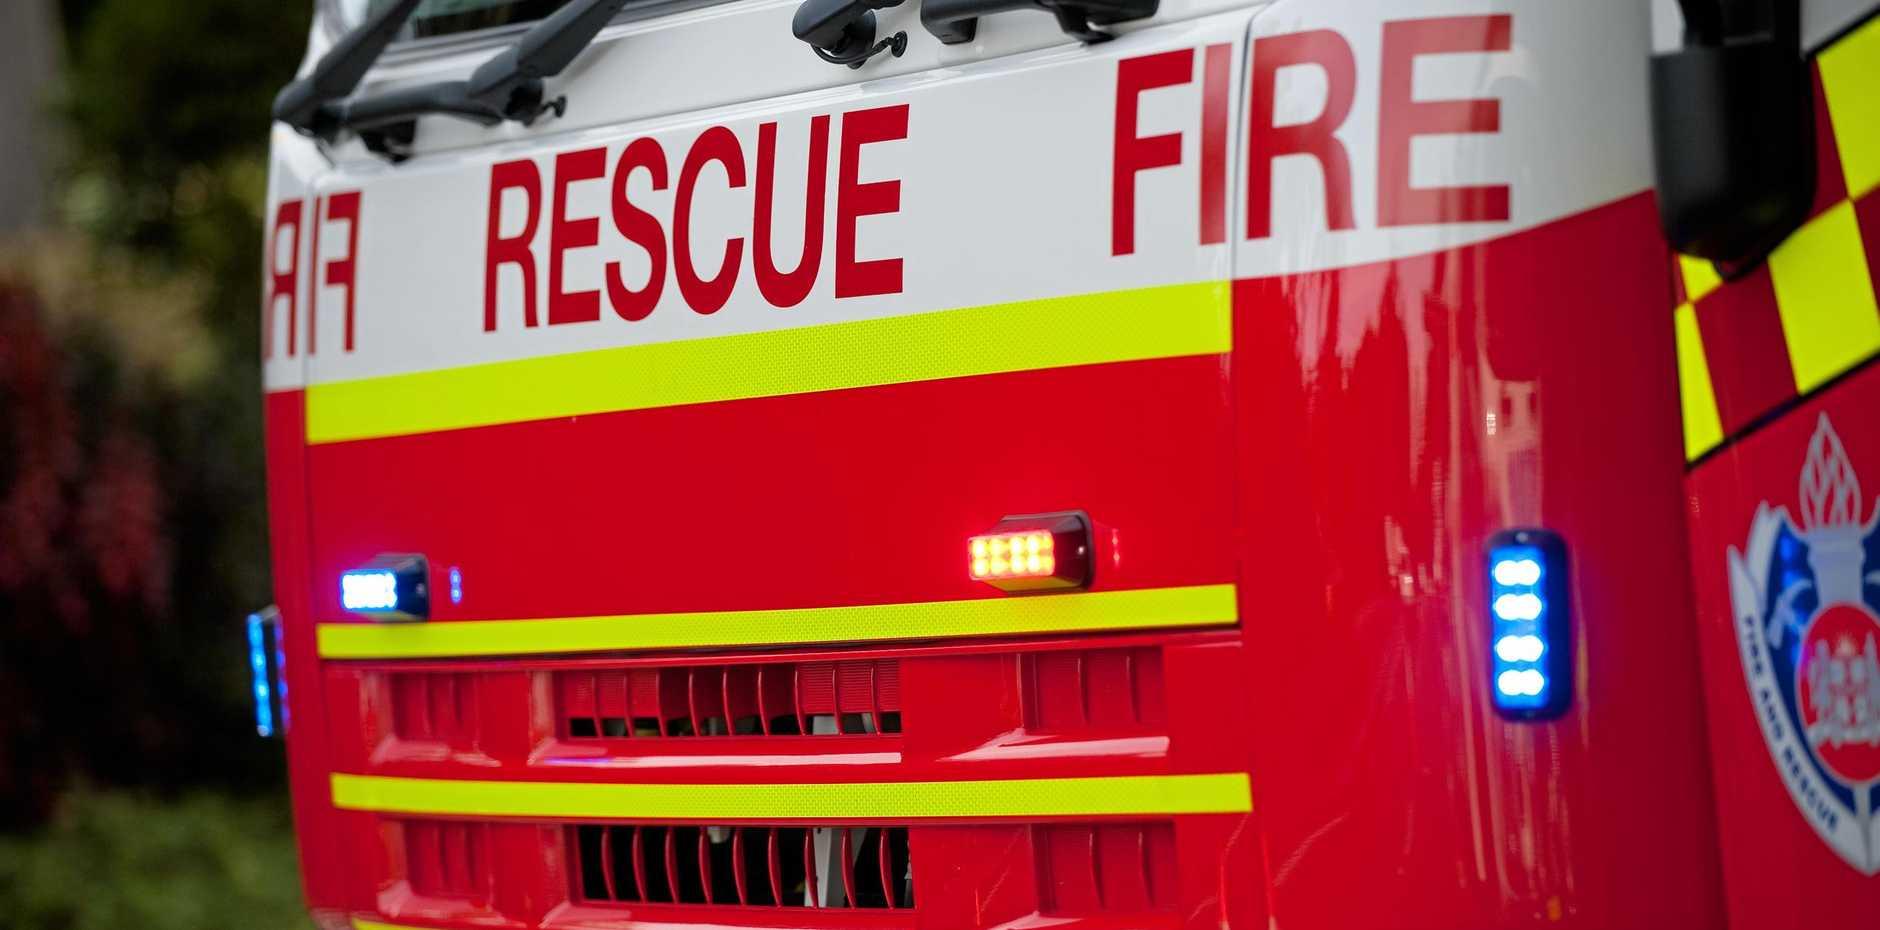 NSW Fire Rescue Truck Photo: Trevor Veale / The Coffs Coast Advocate.